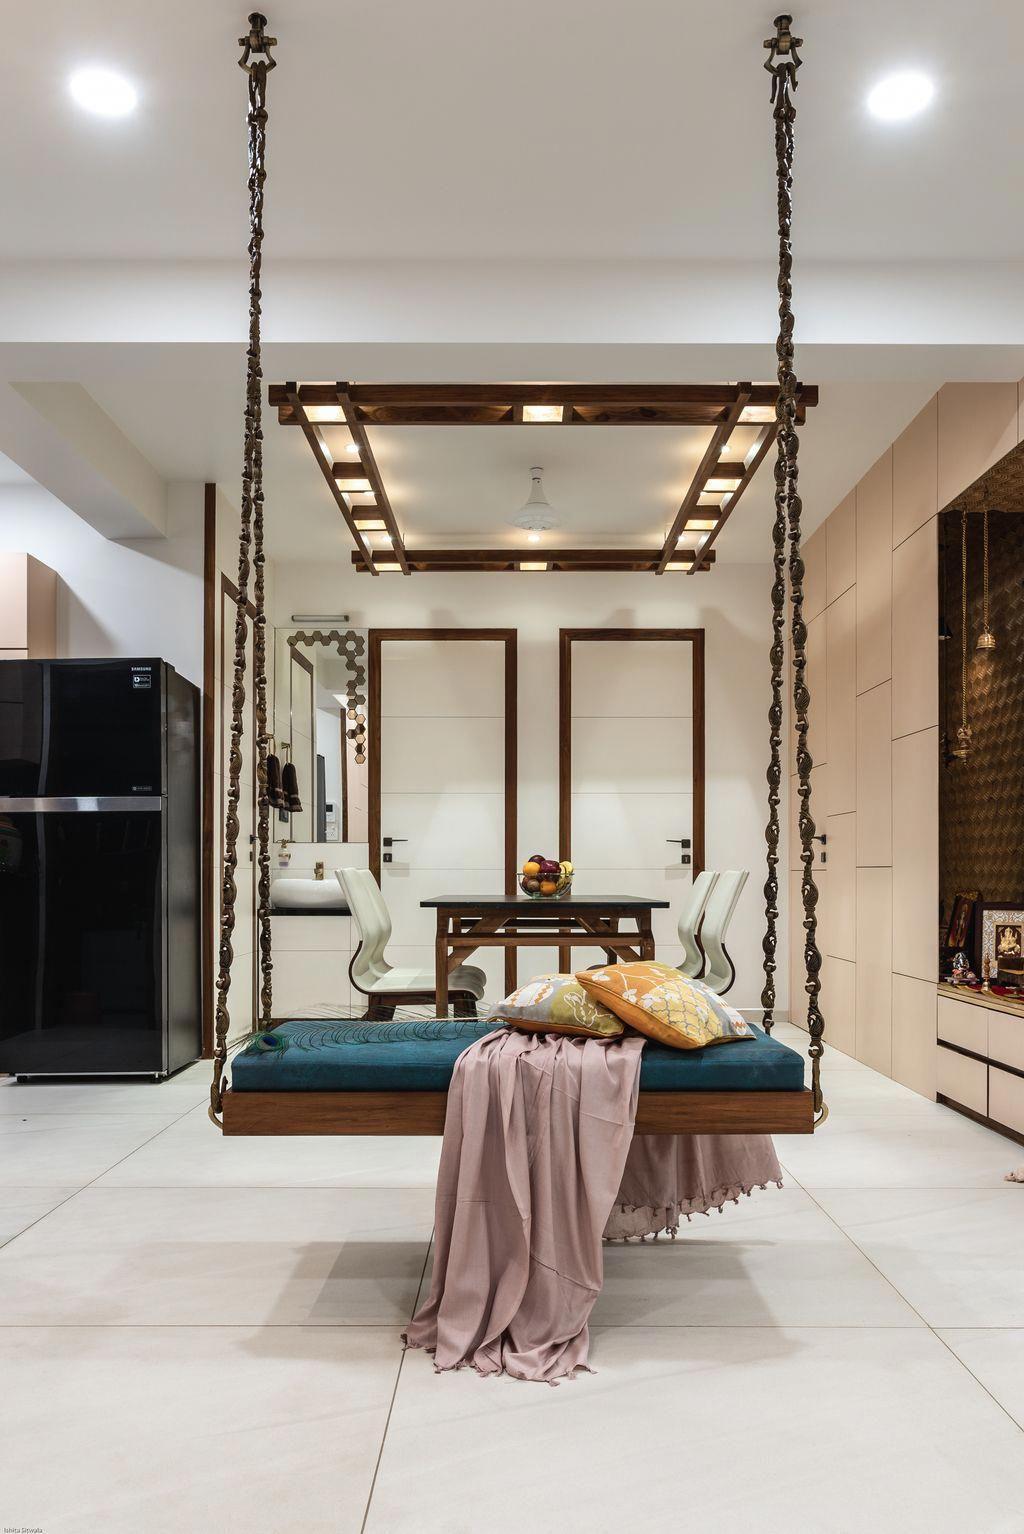 Pavan infratech exteriordesignapartment wooden swings swing seat indian home decor also interior rh pinterest